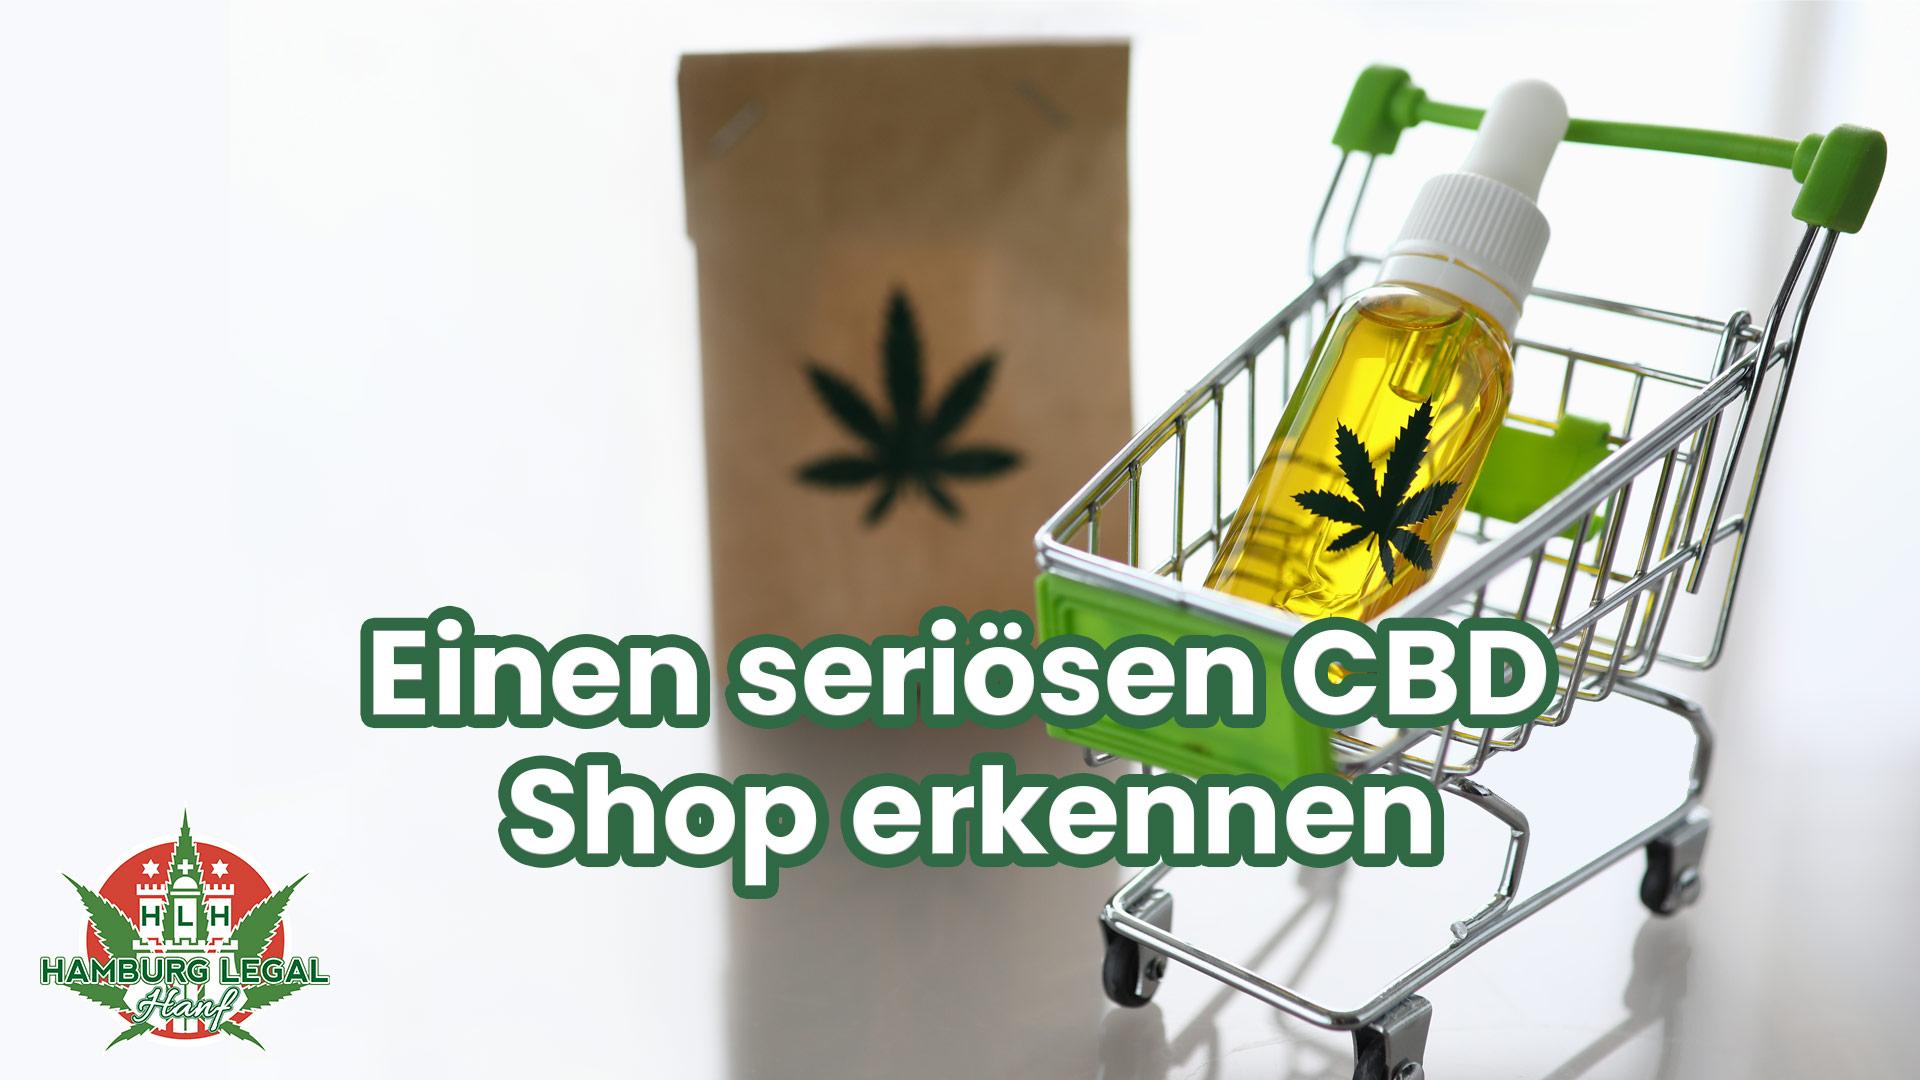 Einen seriösen CBD Shop erkennen